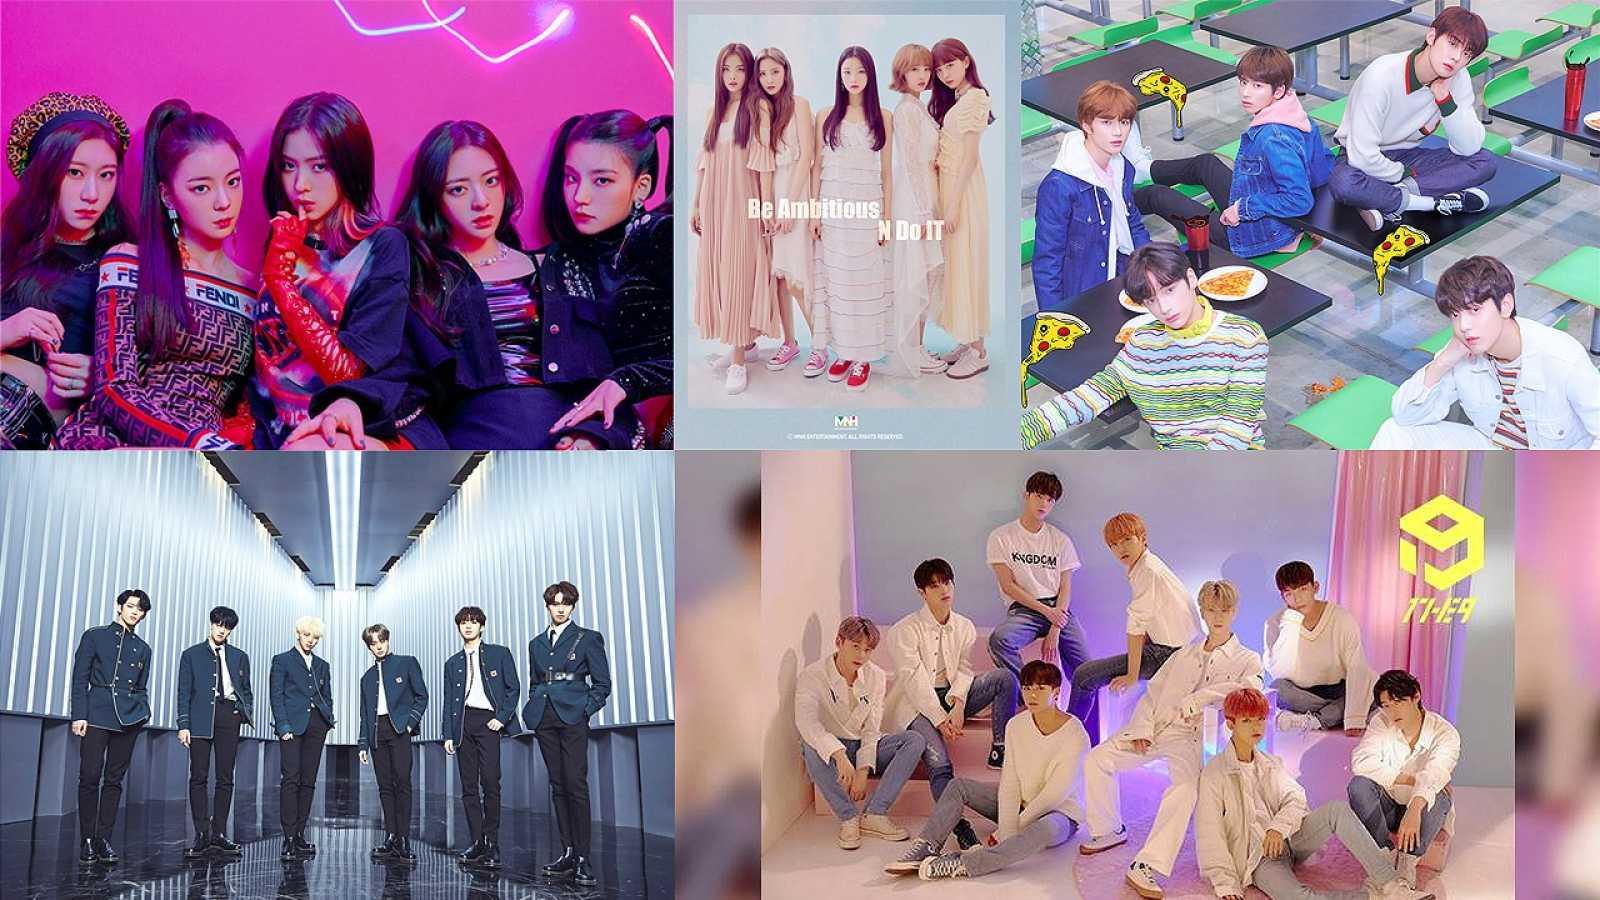 Kpop-kevään 2019 uudet kasvot